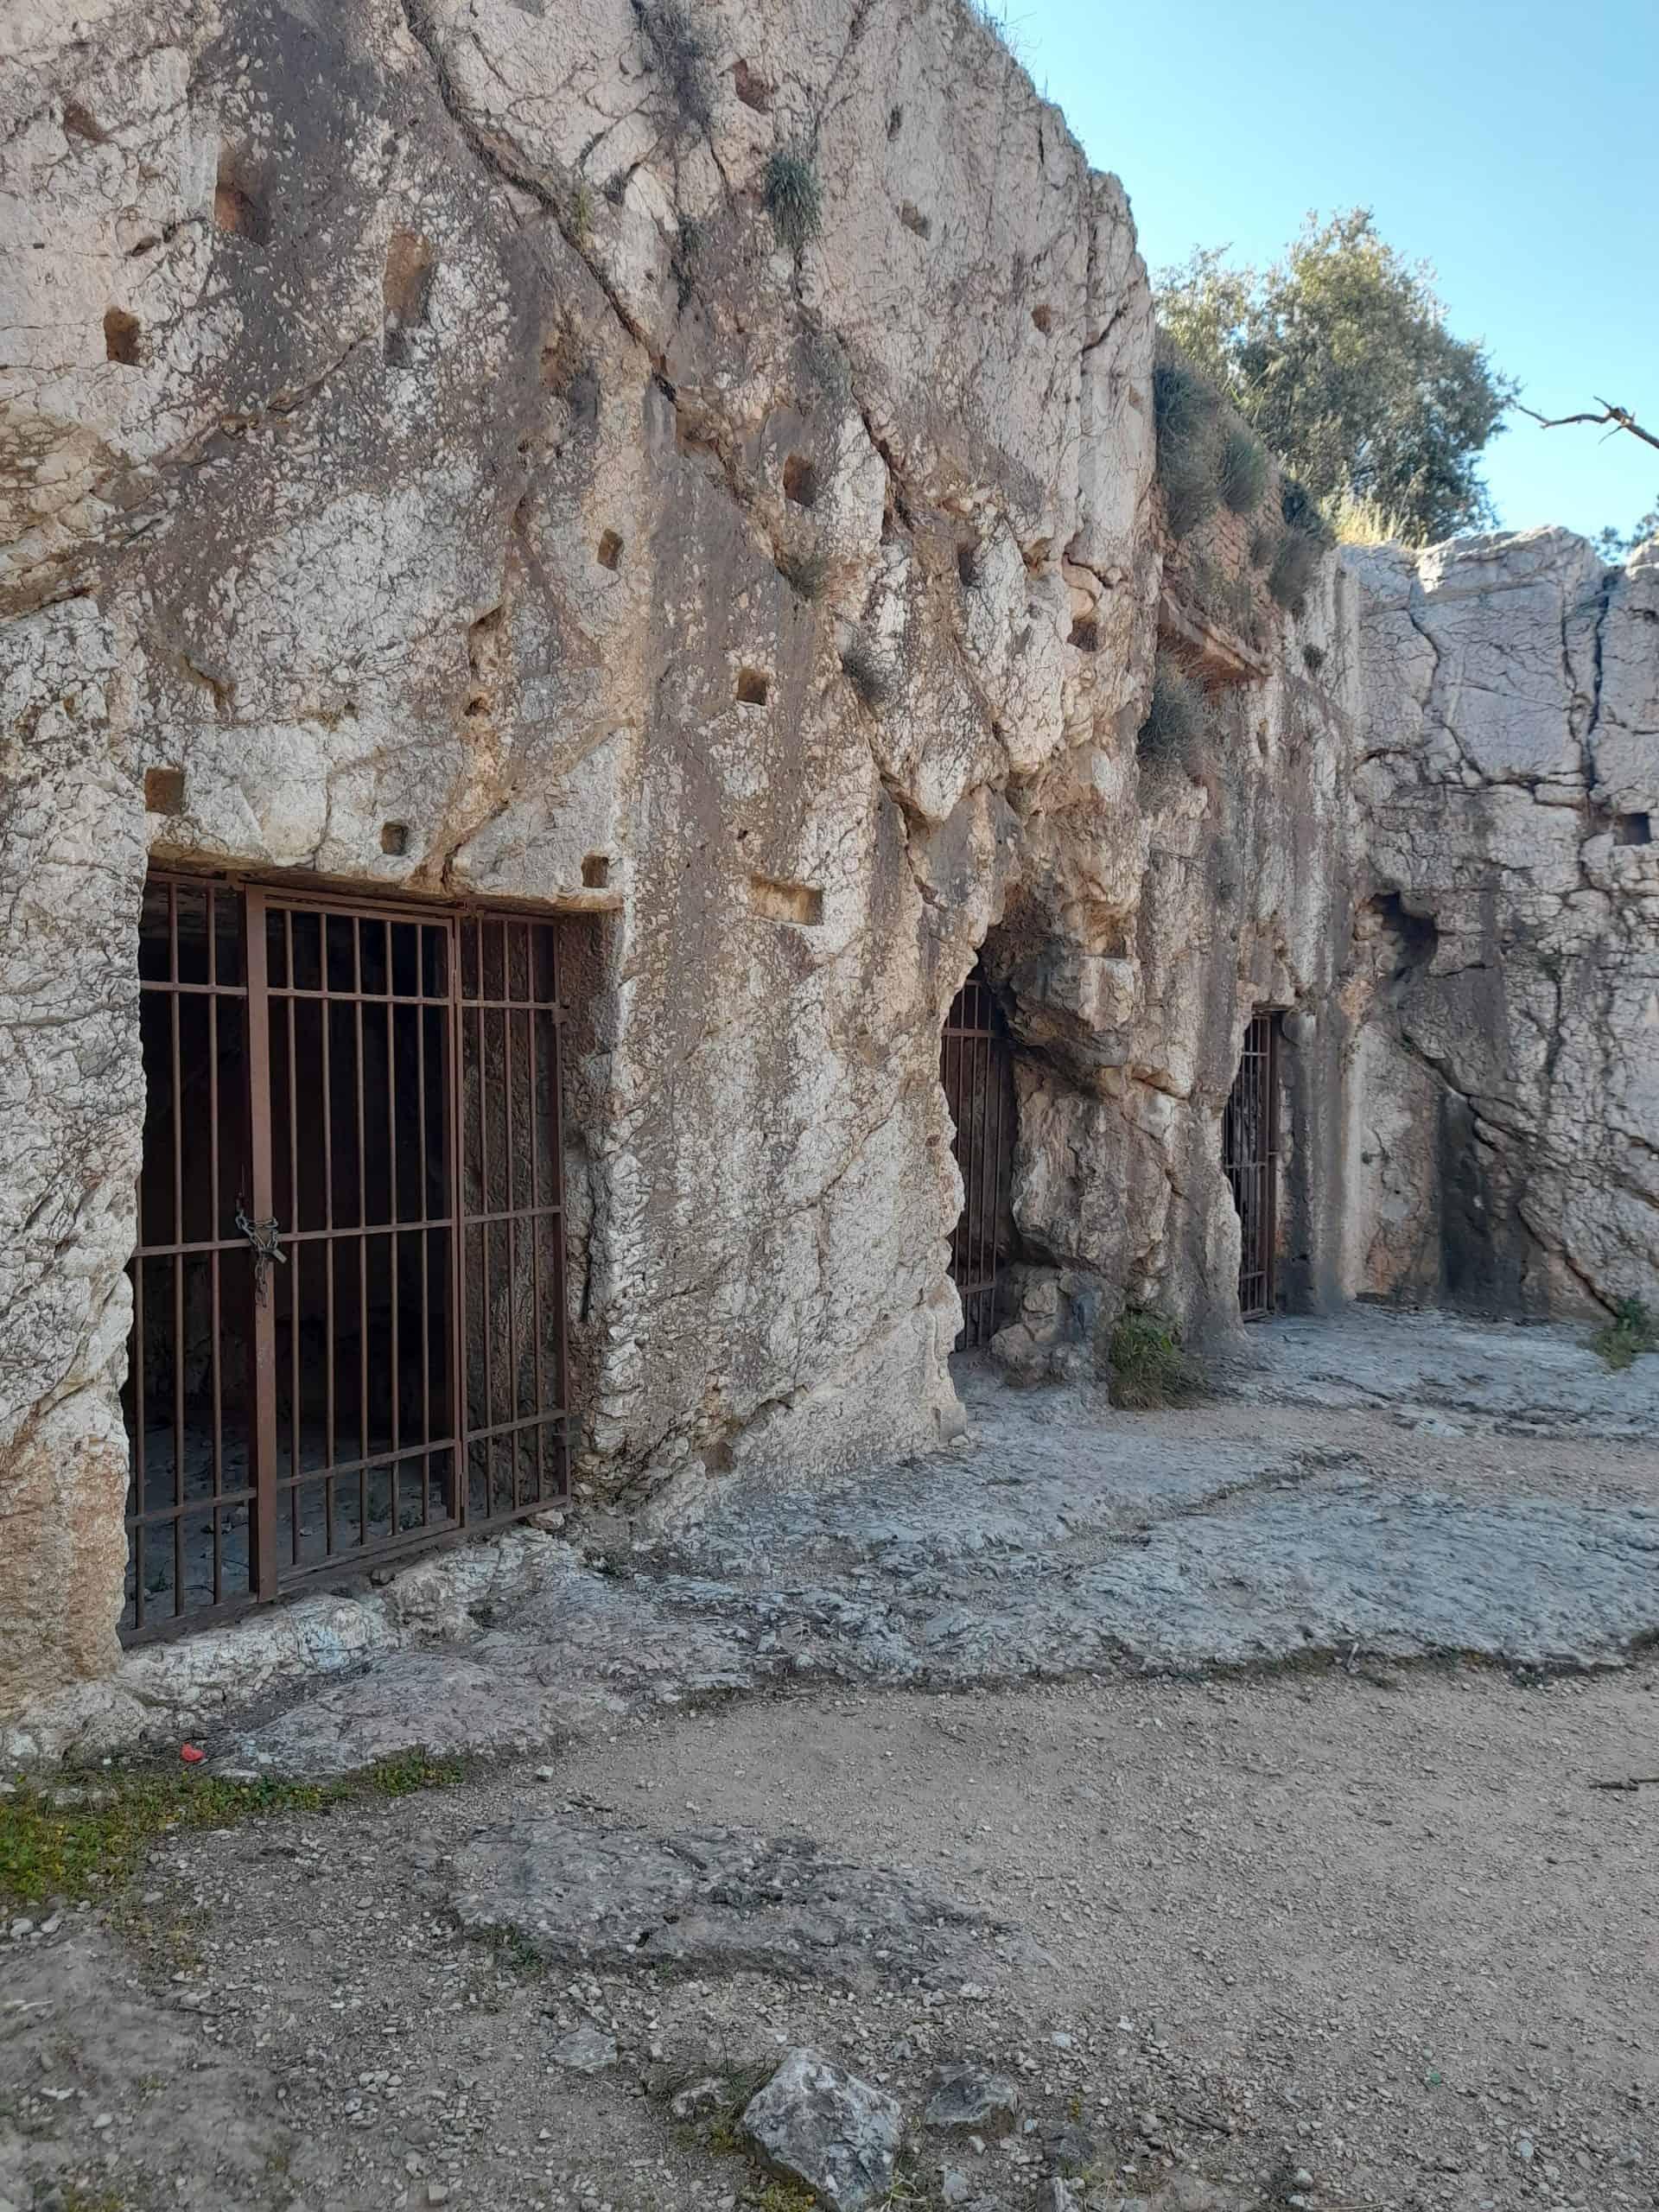 Landmarks of Athens: Socrates Prison